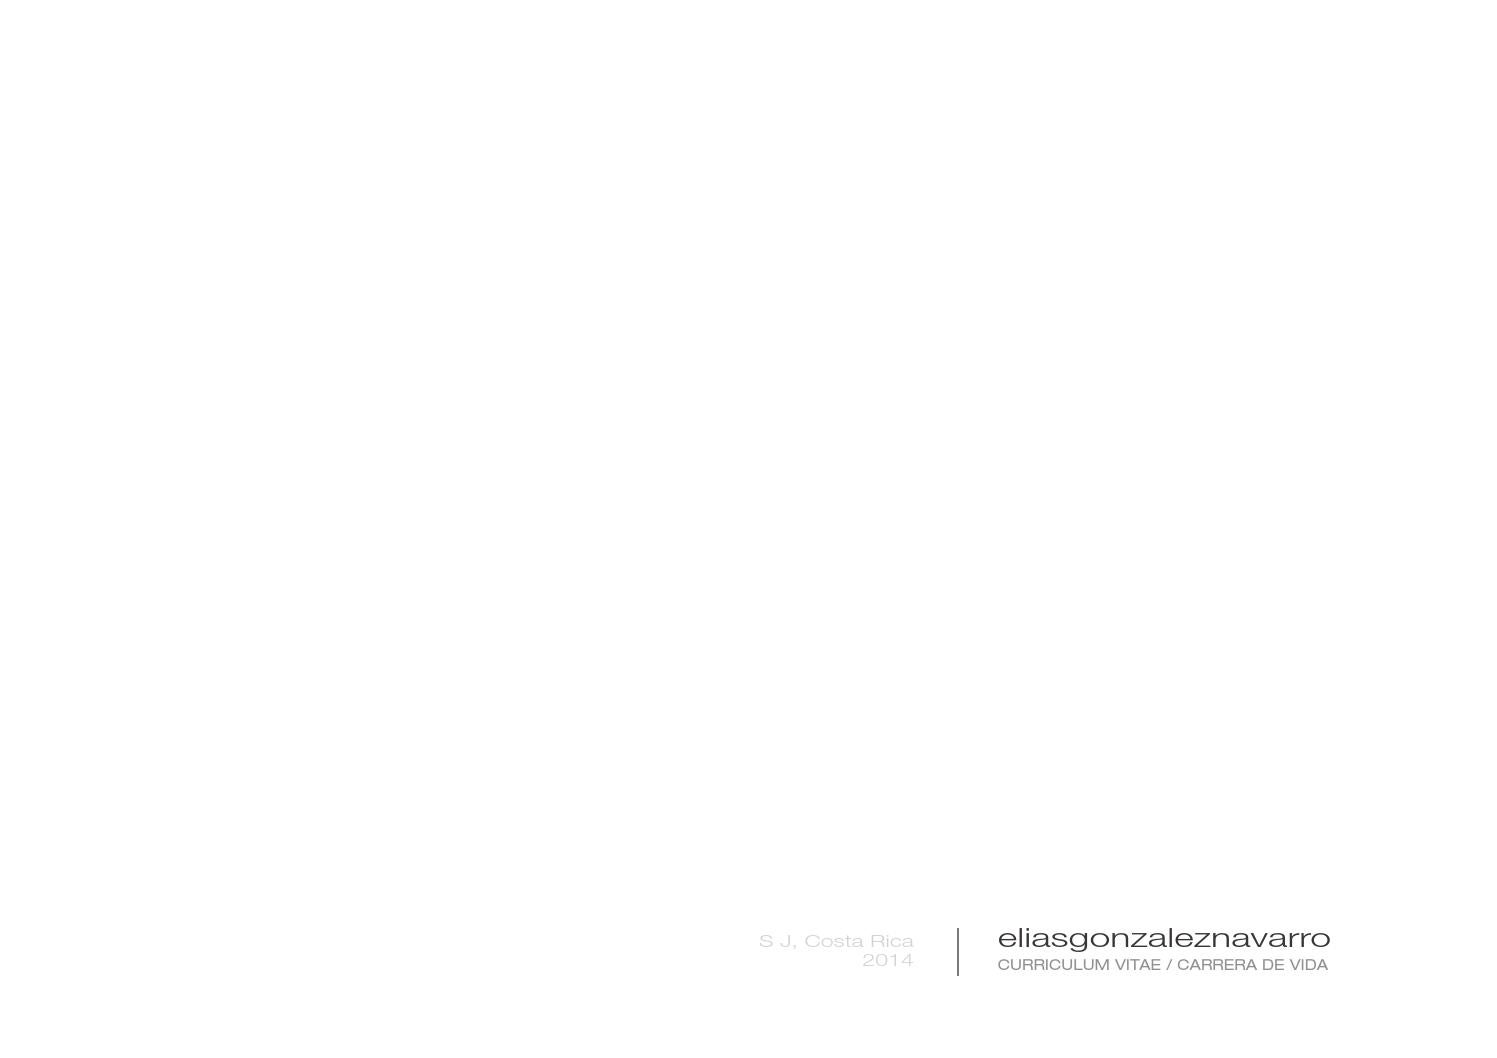 Curriculum Vitae by Elias Gonzalez - issuu